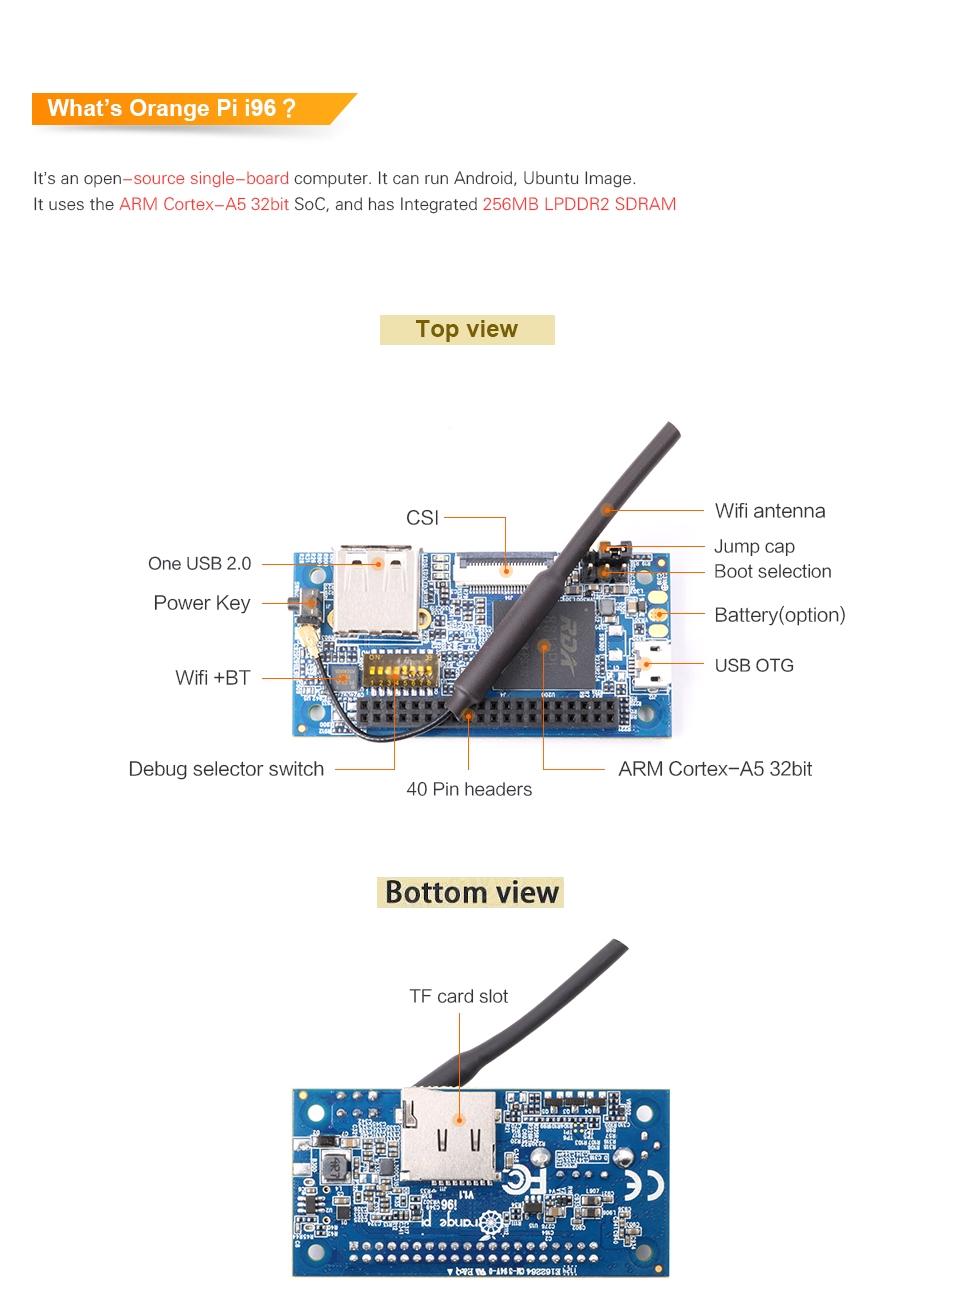 Orange Pi i96 256MB Cortex-A5 32bit Development Board With WIFI And Bluetooth Mini PC 5